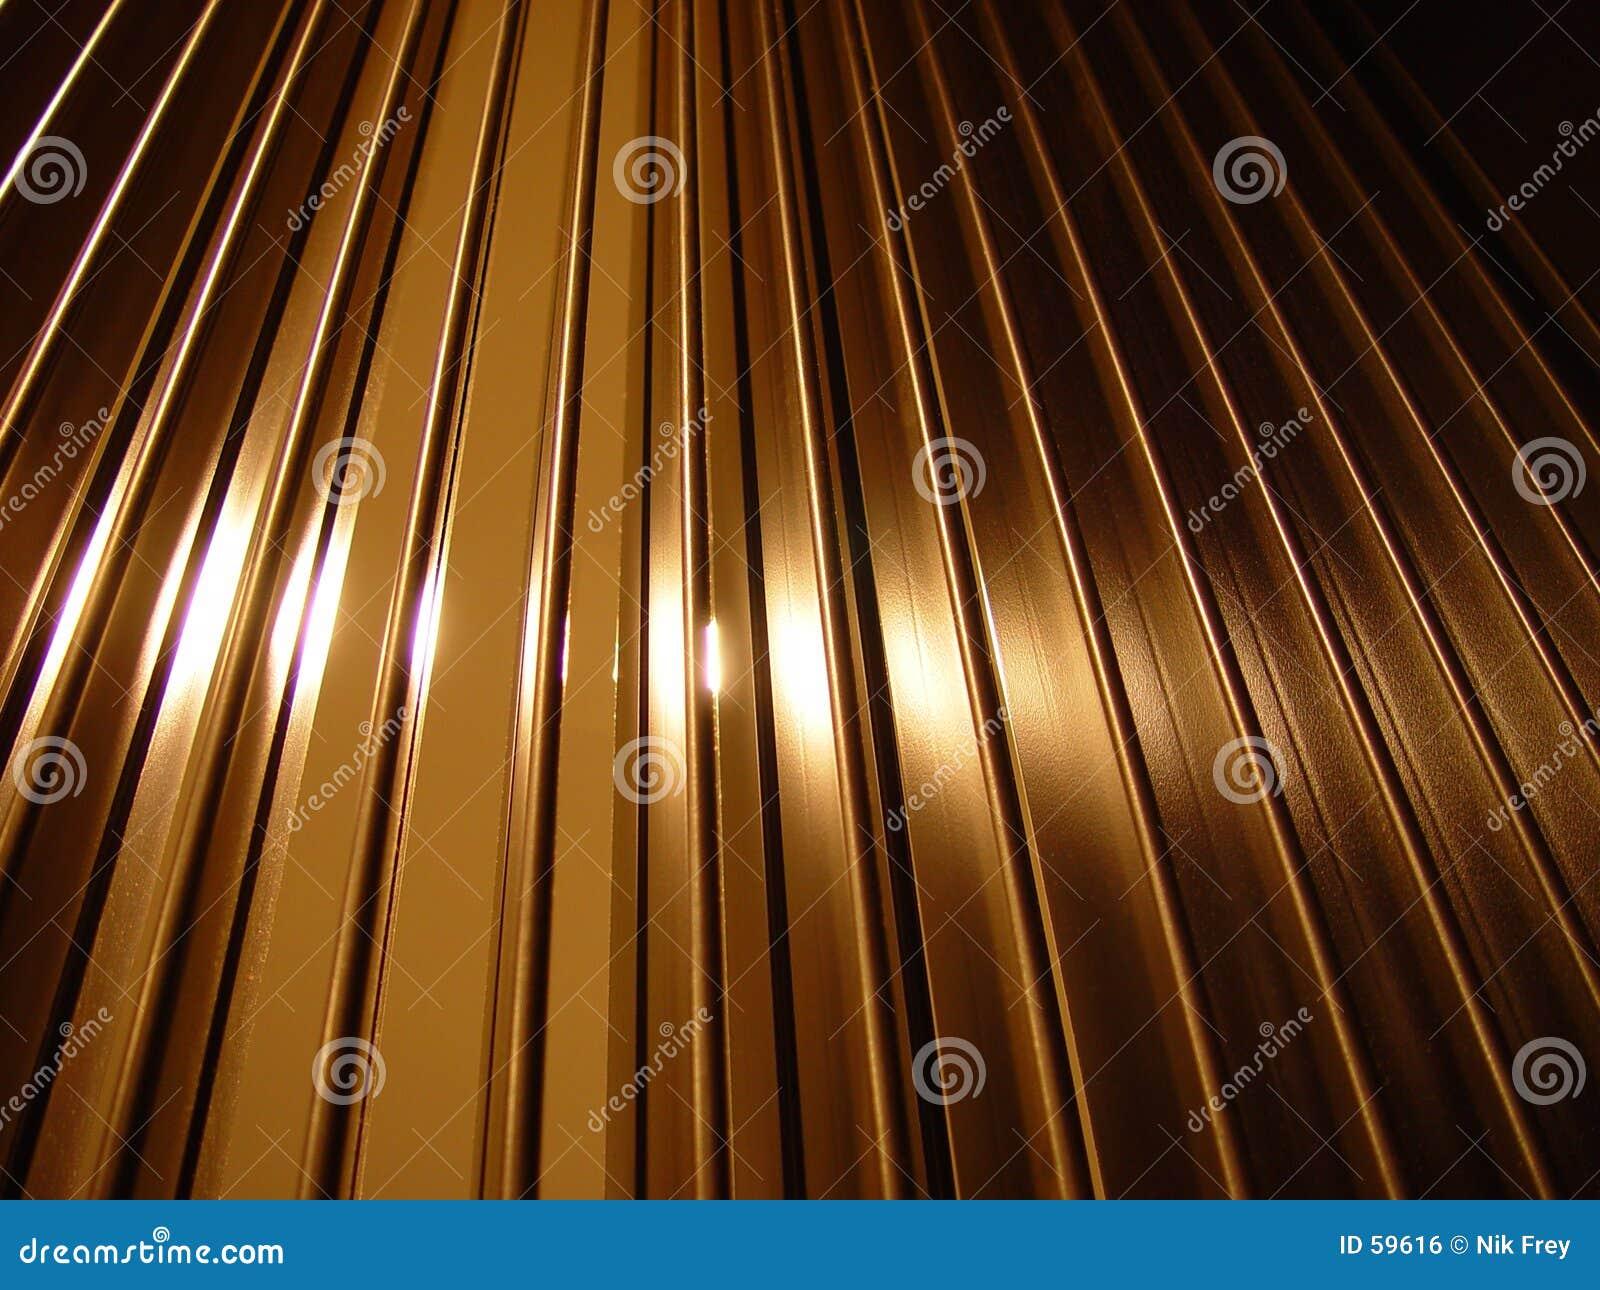 Download μέταλλο ράβδων στοκ εικόνες. εικόνα από ανασκόπησης, ράβδων - 59616